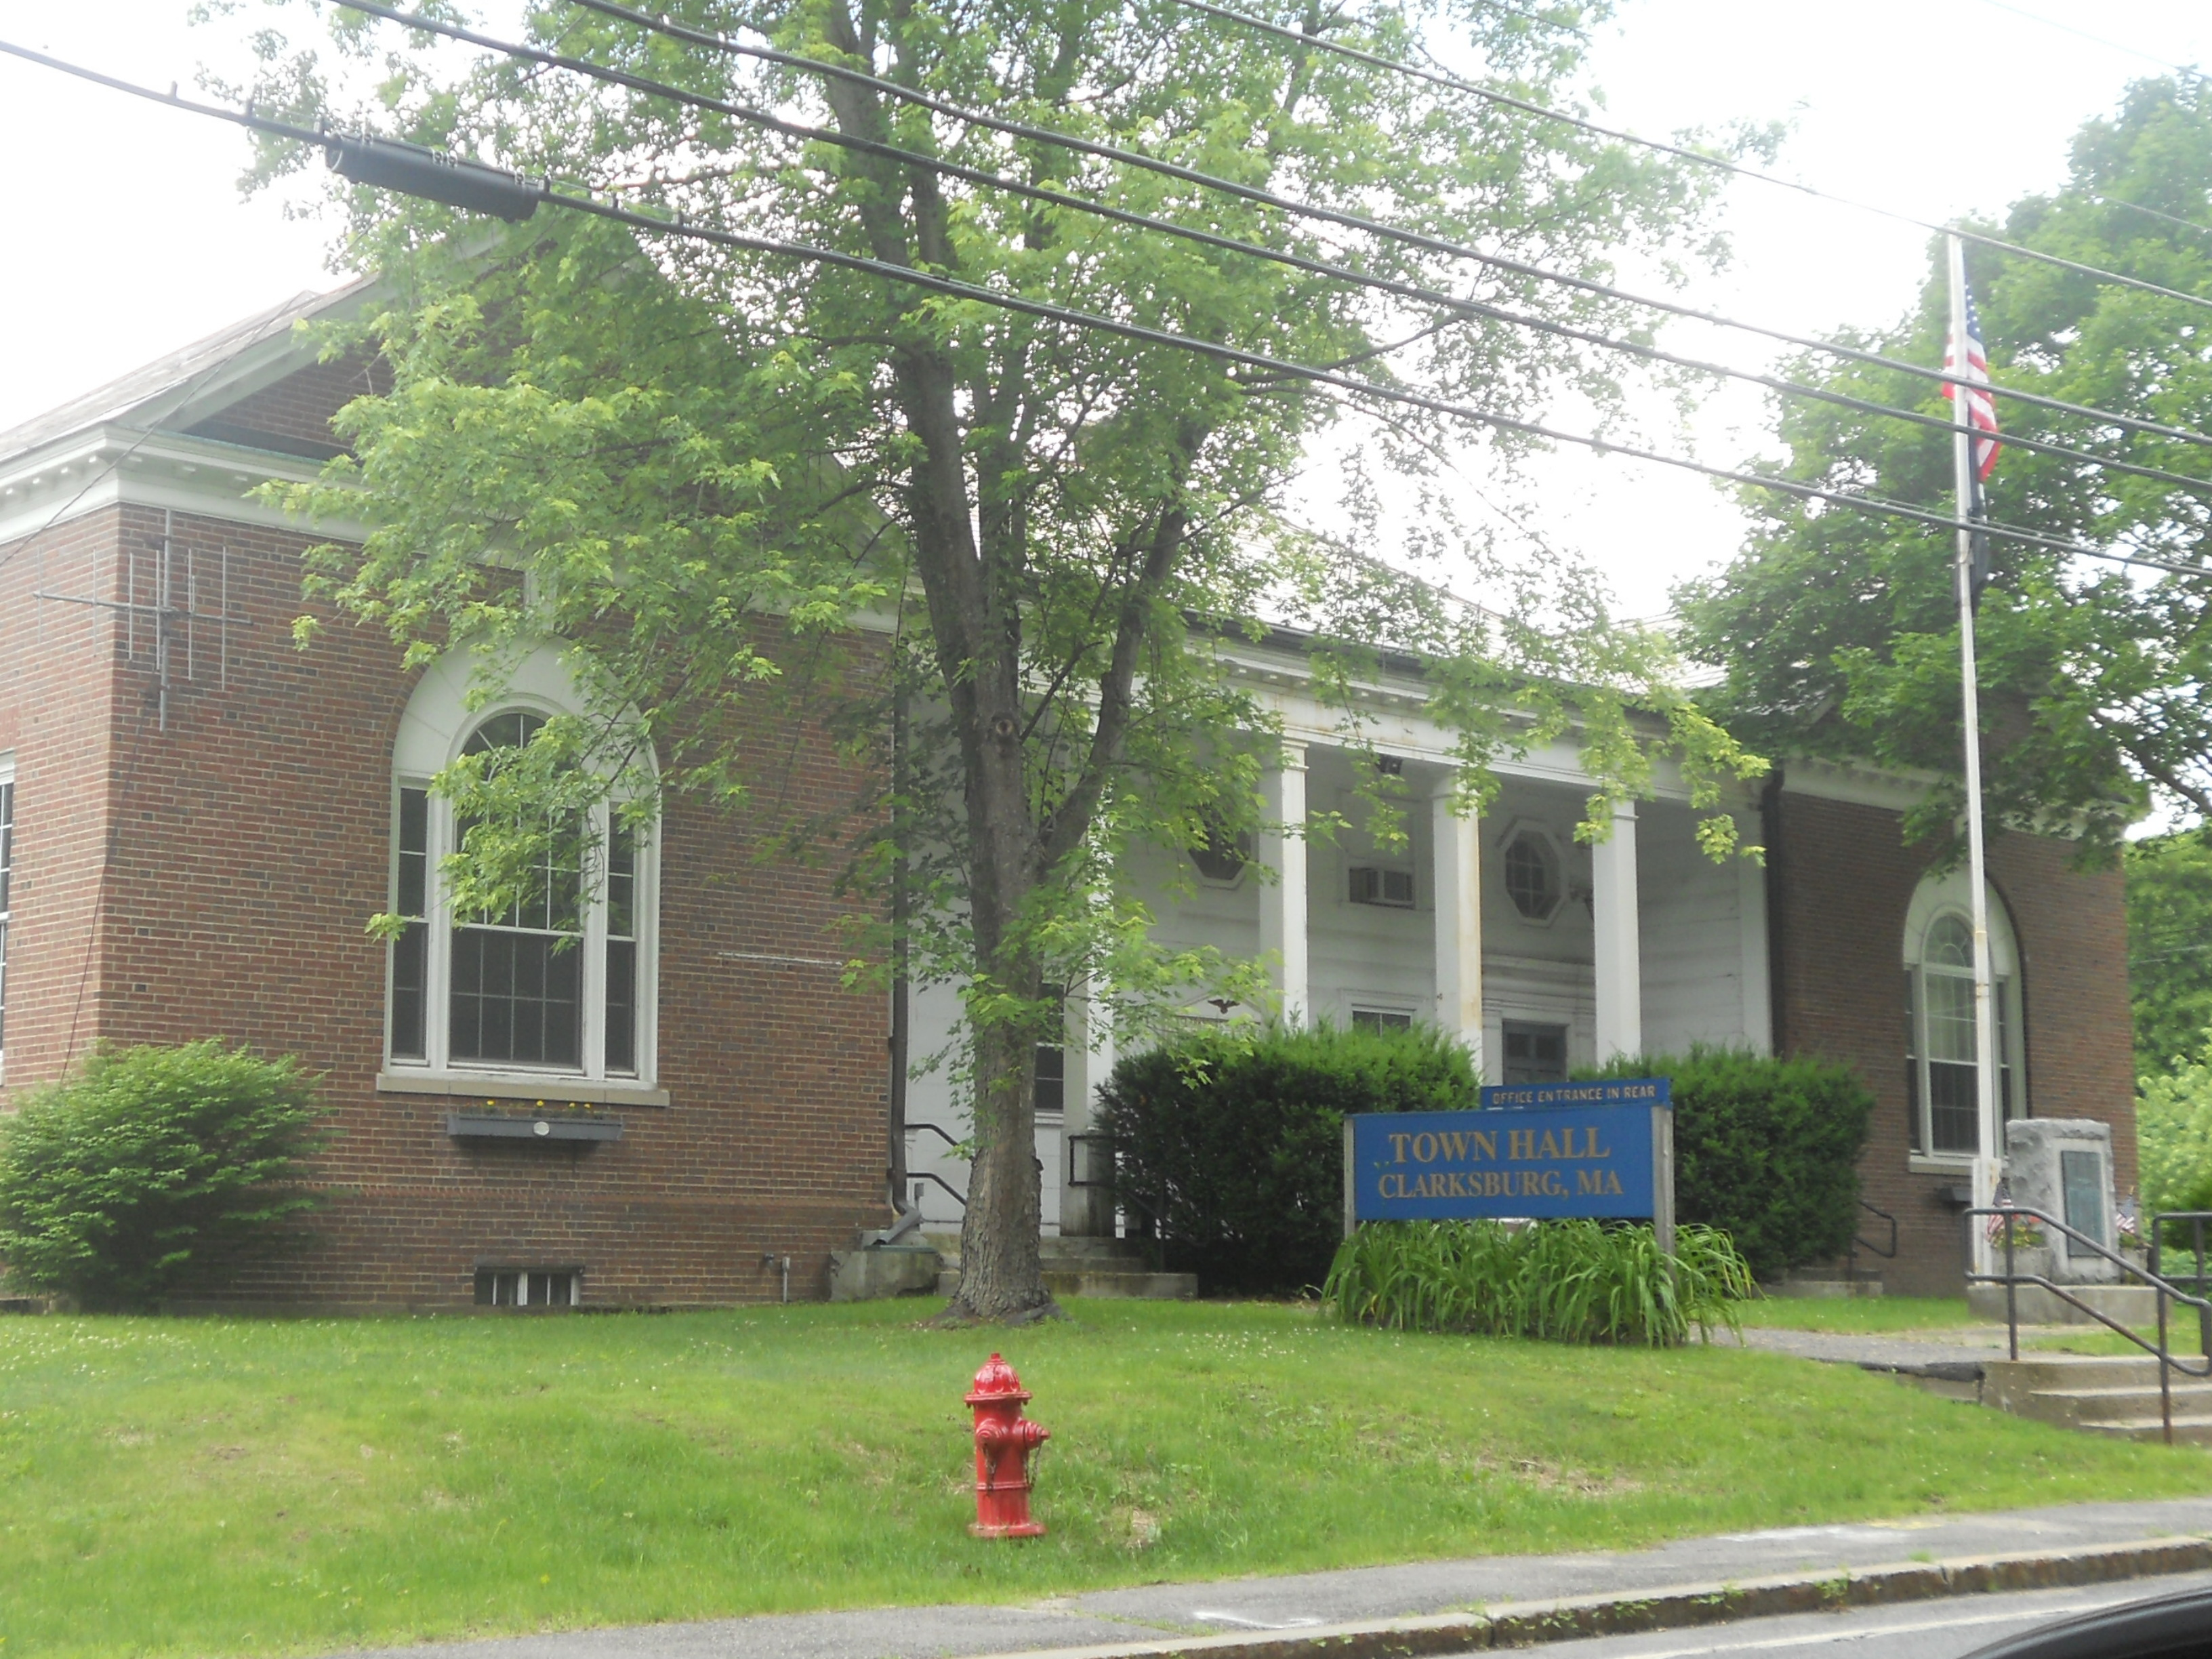 Clarksburg Town Hall